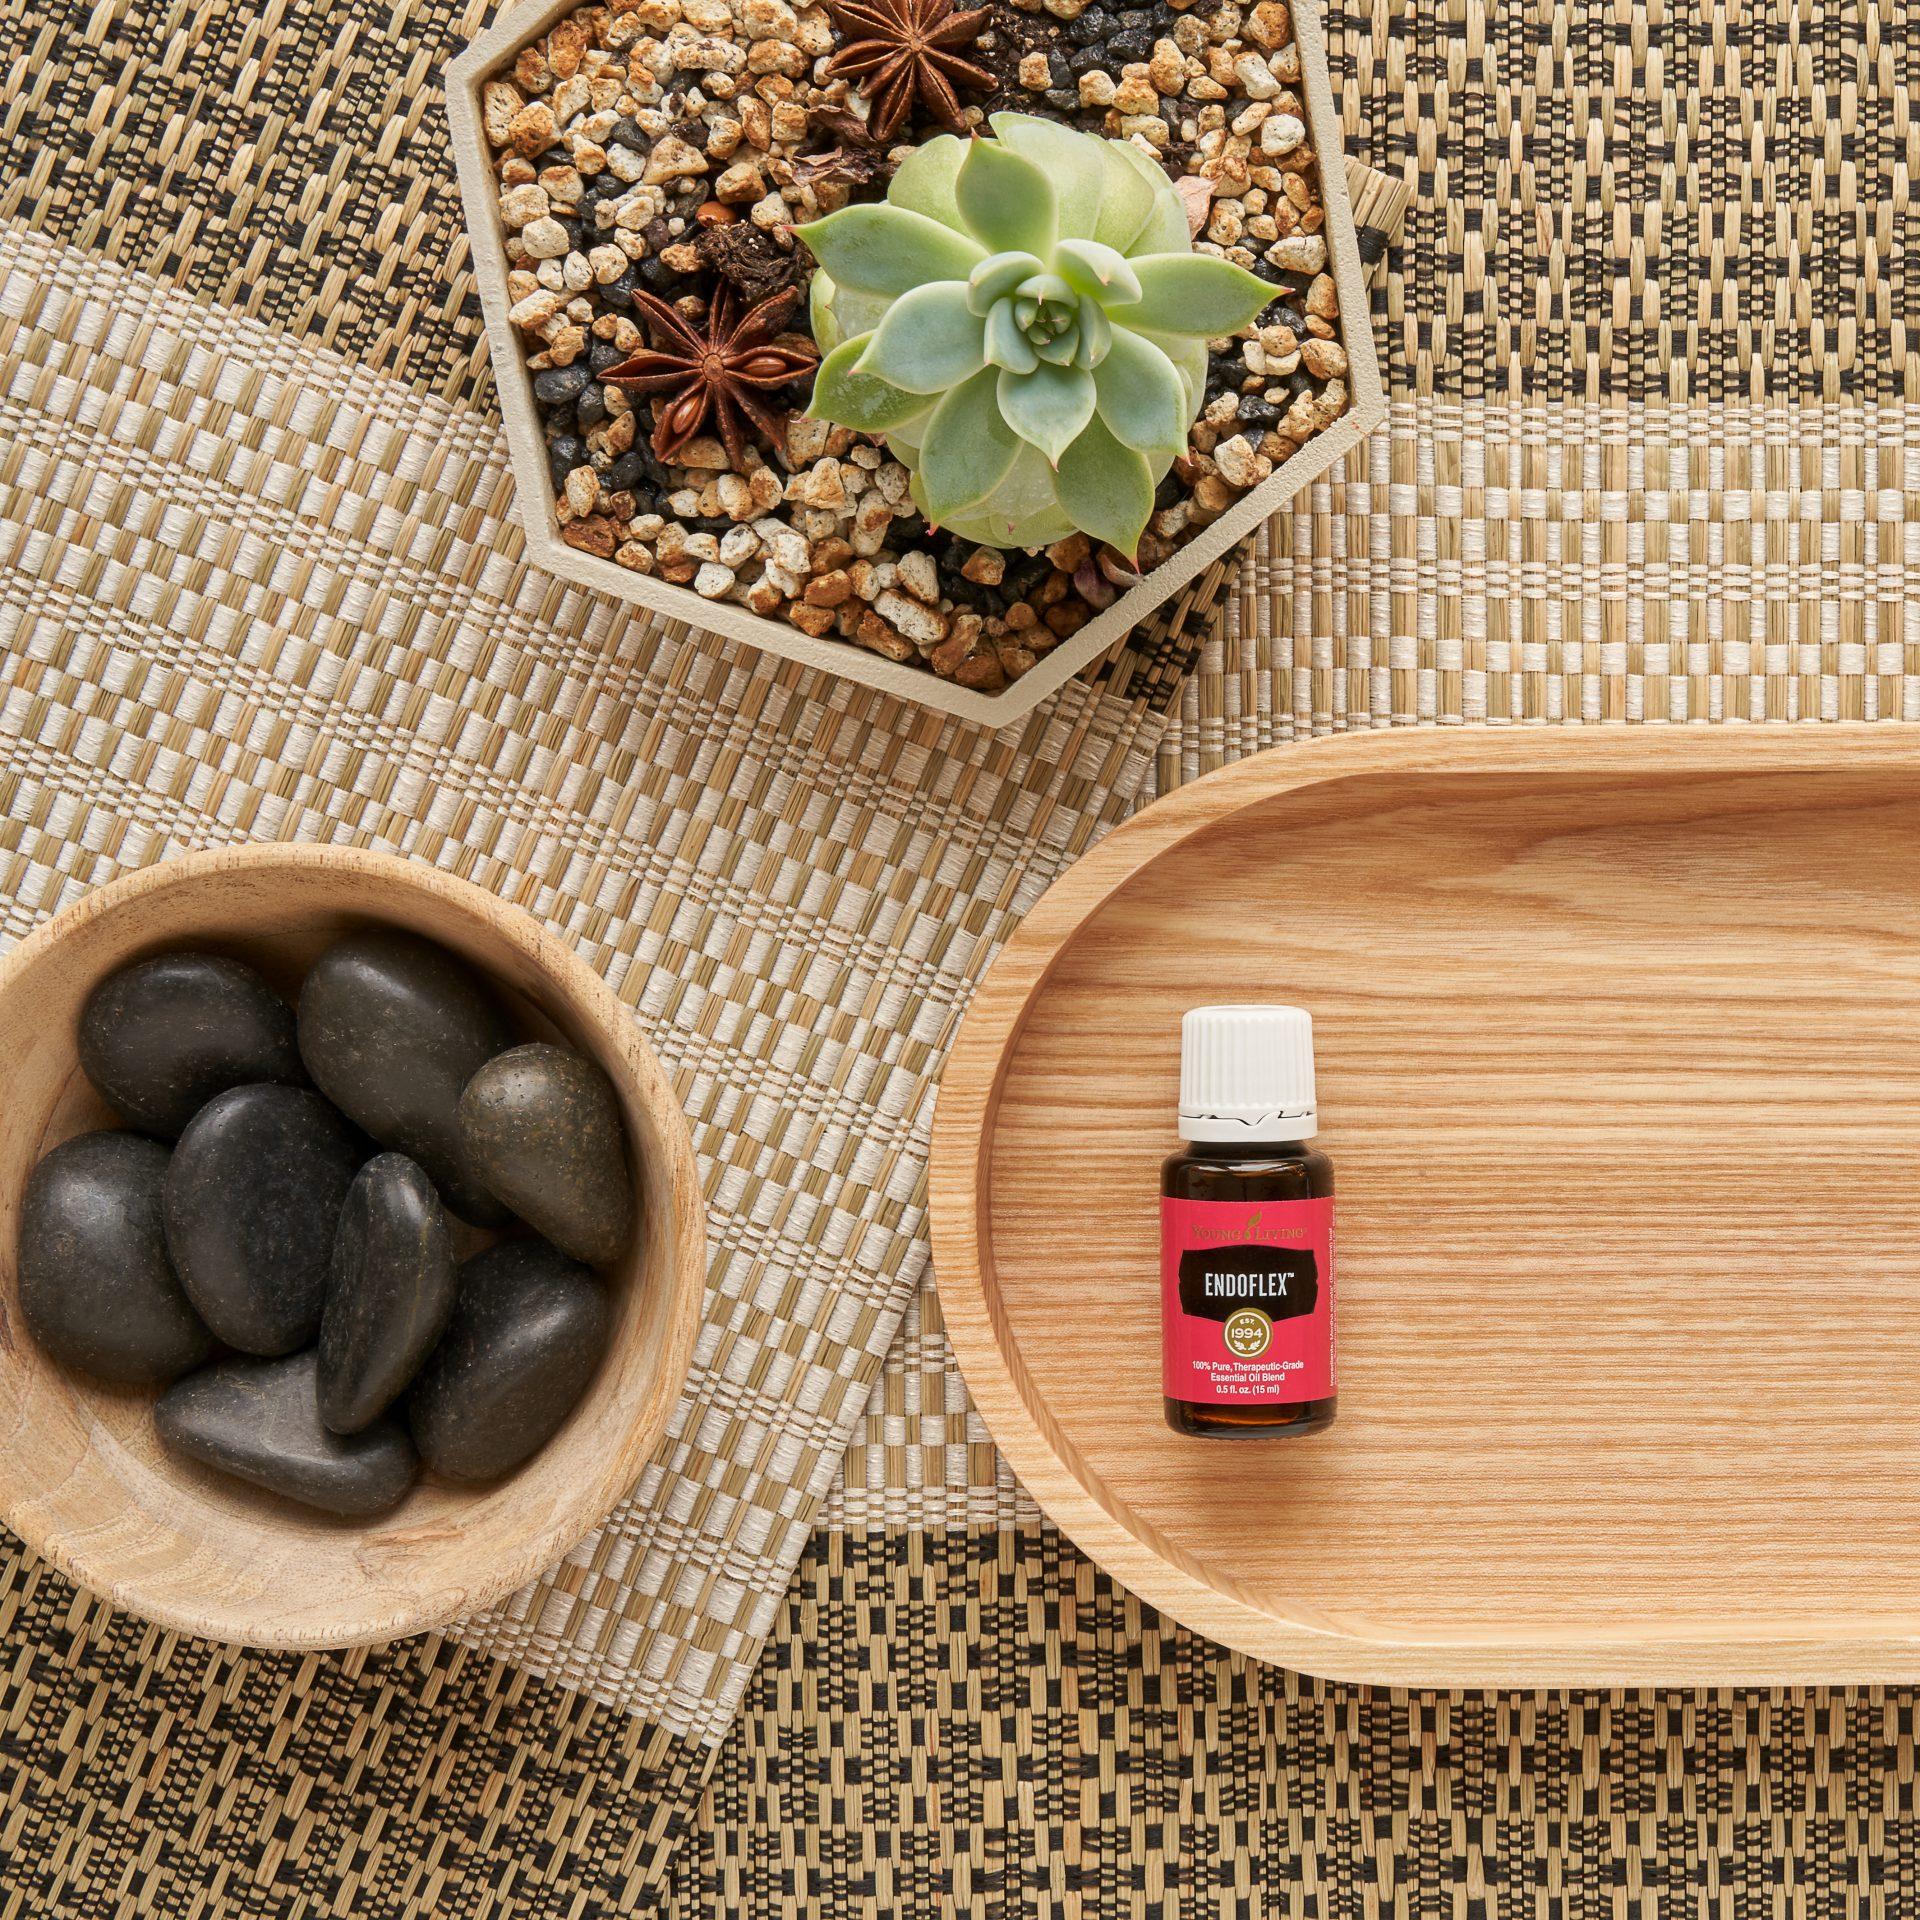 Endoflex Essential Oil Blend - Young Living Essential Oils